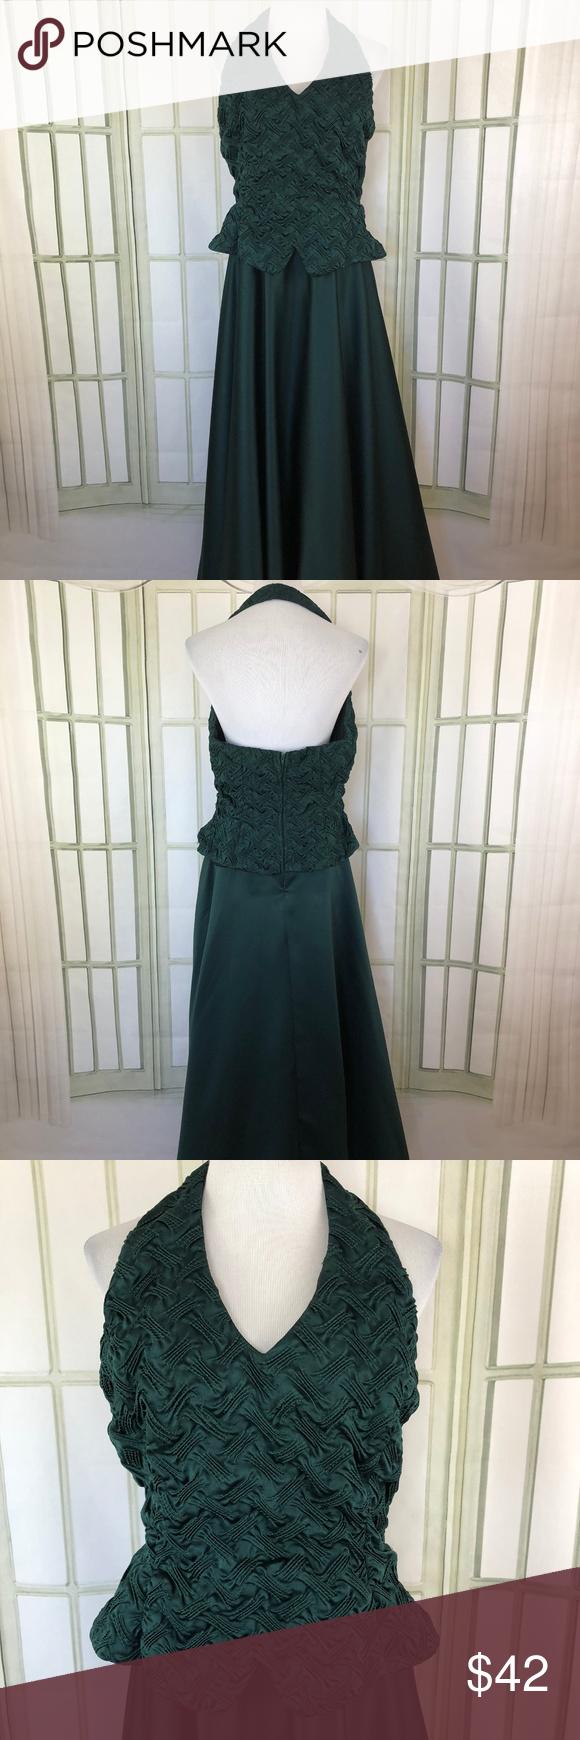 Vintage 1990s Brocade Bodice Halter Prom Dress Halter Prom Dresses Dresses Prom Dresses Vintage [ 1740 x 580 Pixel ]